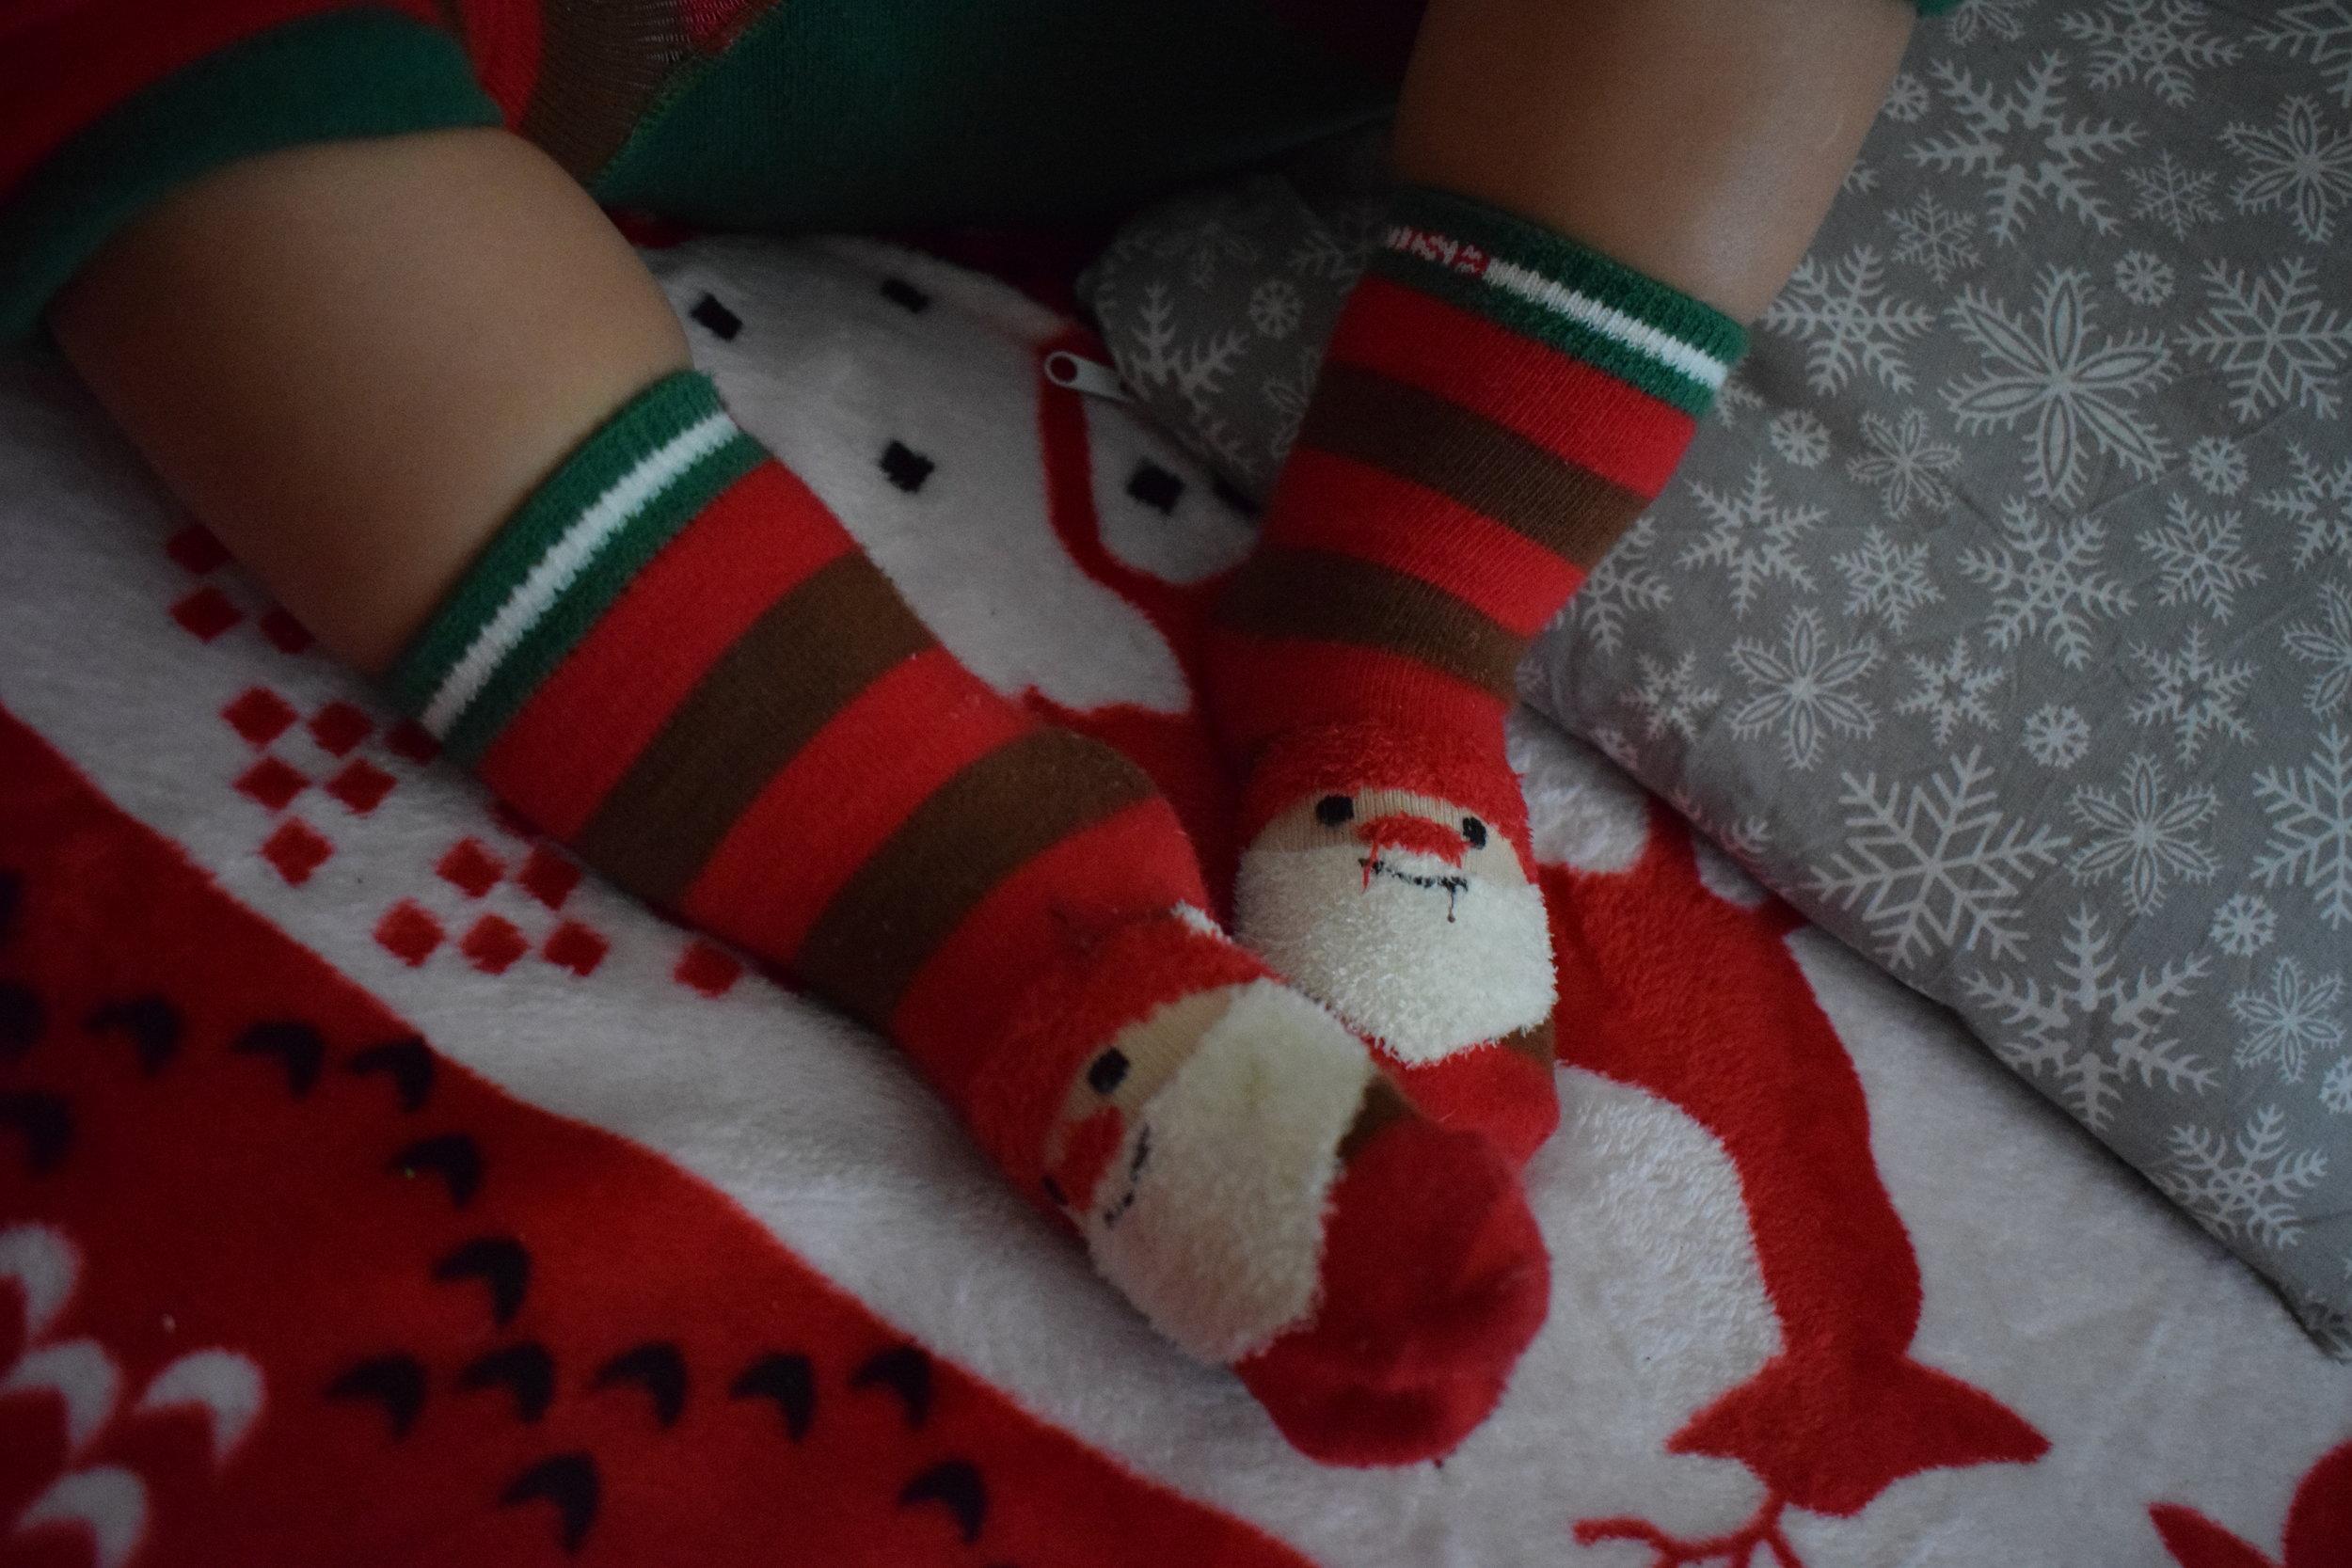 Blade and Rose Santa socks